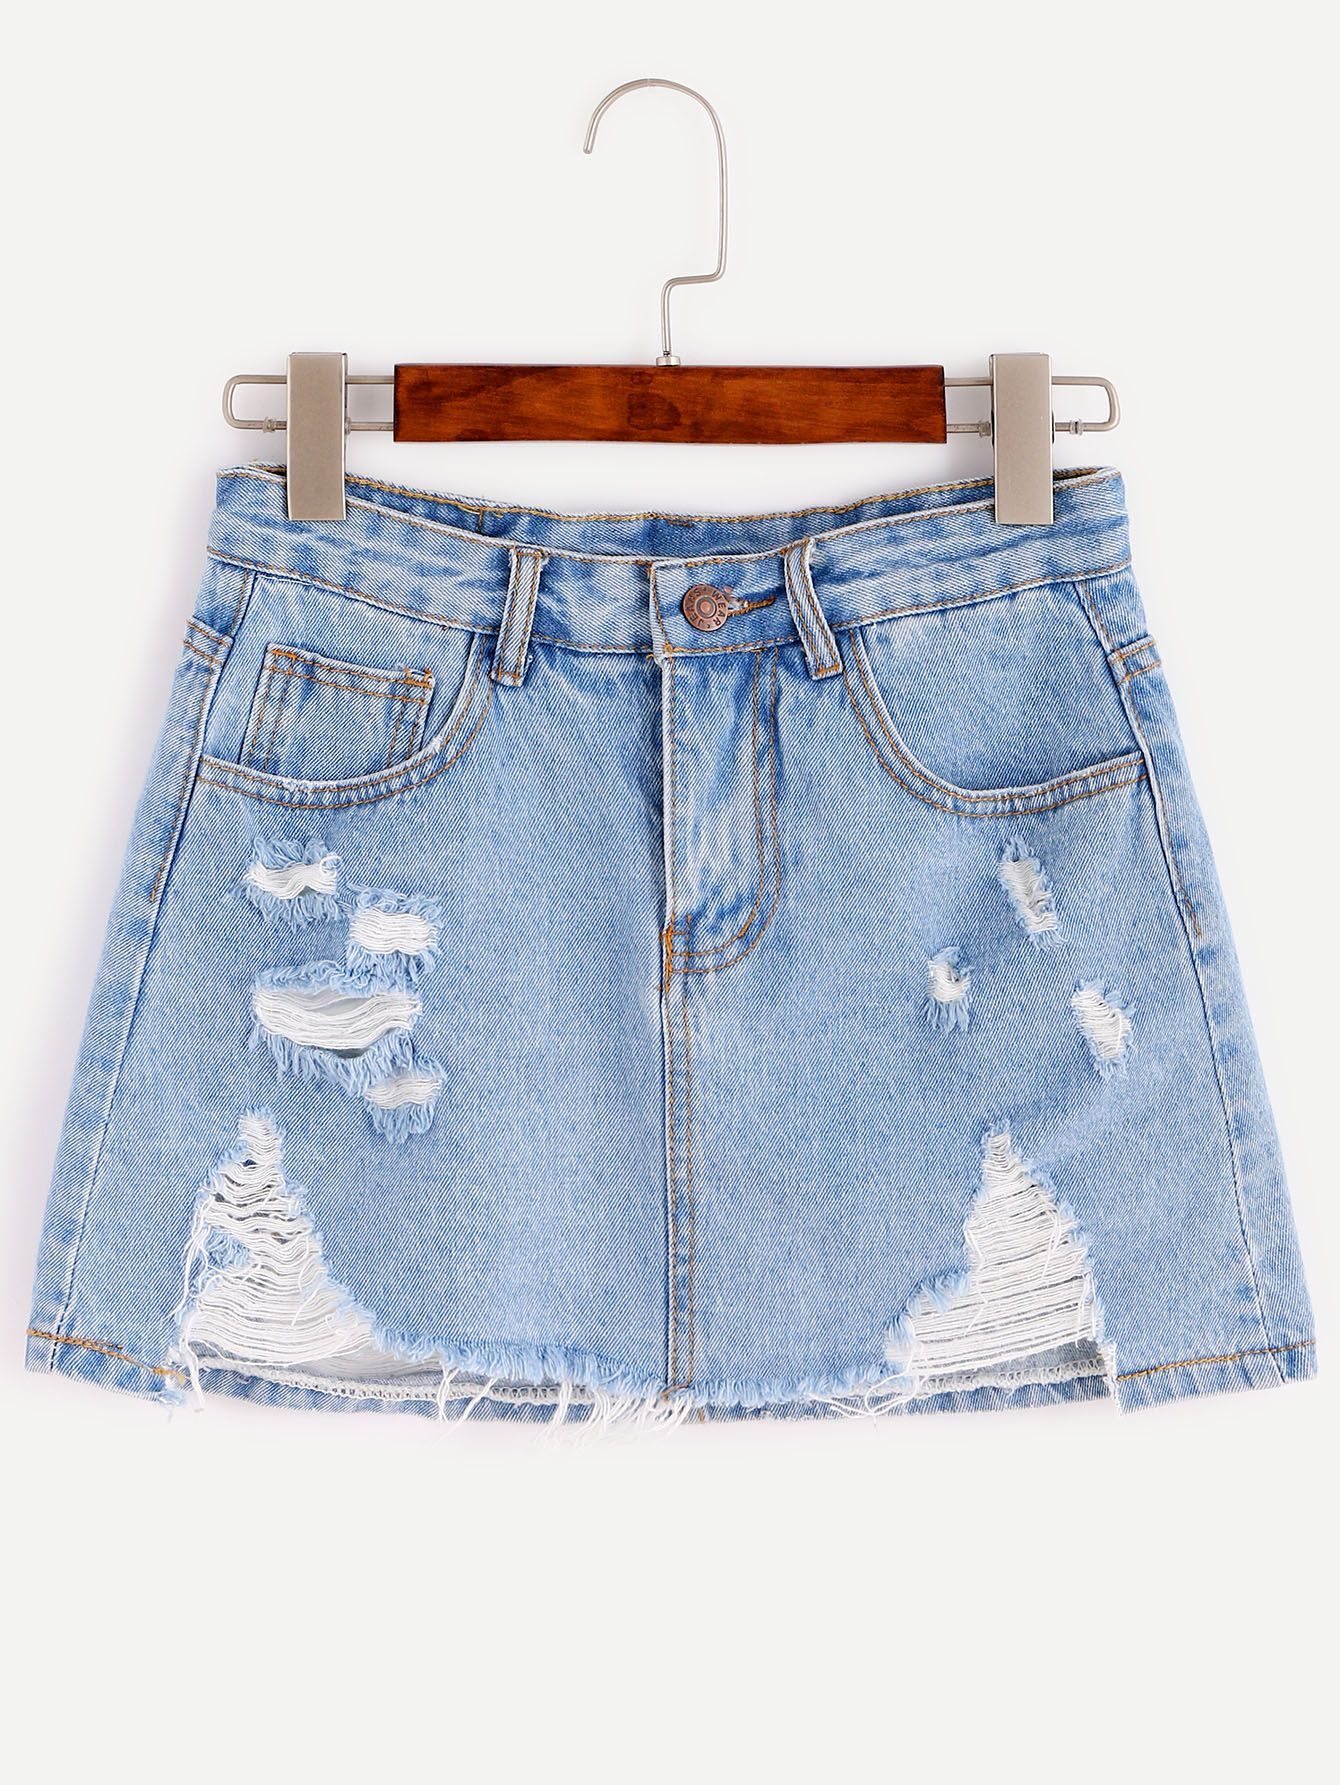 48f3deac1c Shop Blue Bleach Wash Distressed Denim Skirt online. SheIn offers Blue  Bleach Wash Distressed Denim Skirt & more to fit your fashionable needs.